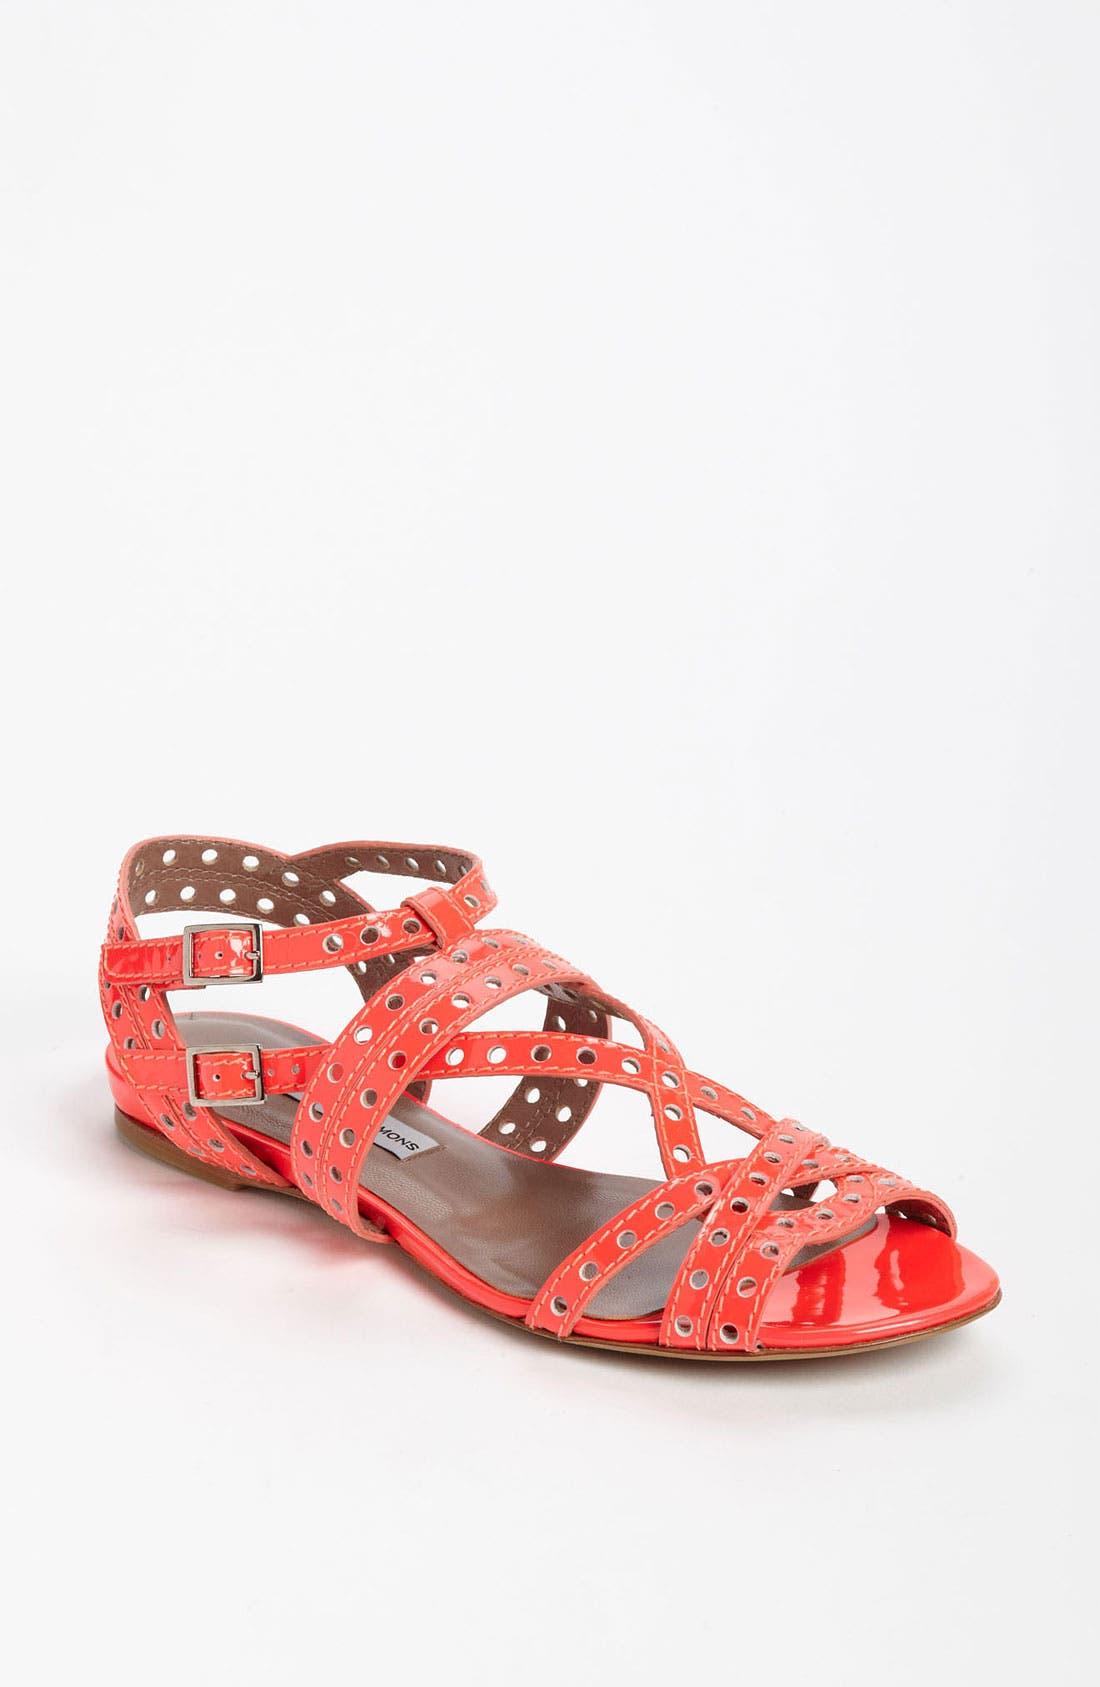 Main Image - Tabitha Simmons 'Felicity' Sandal